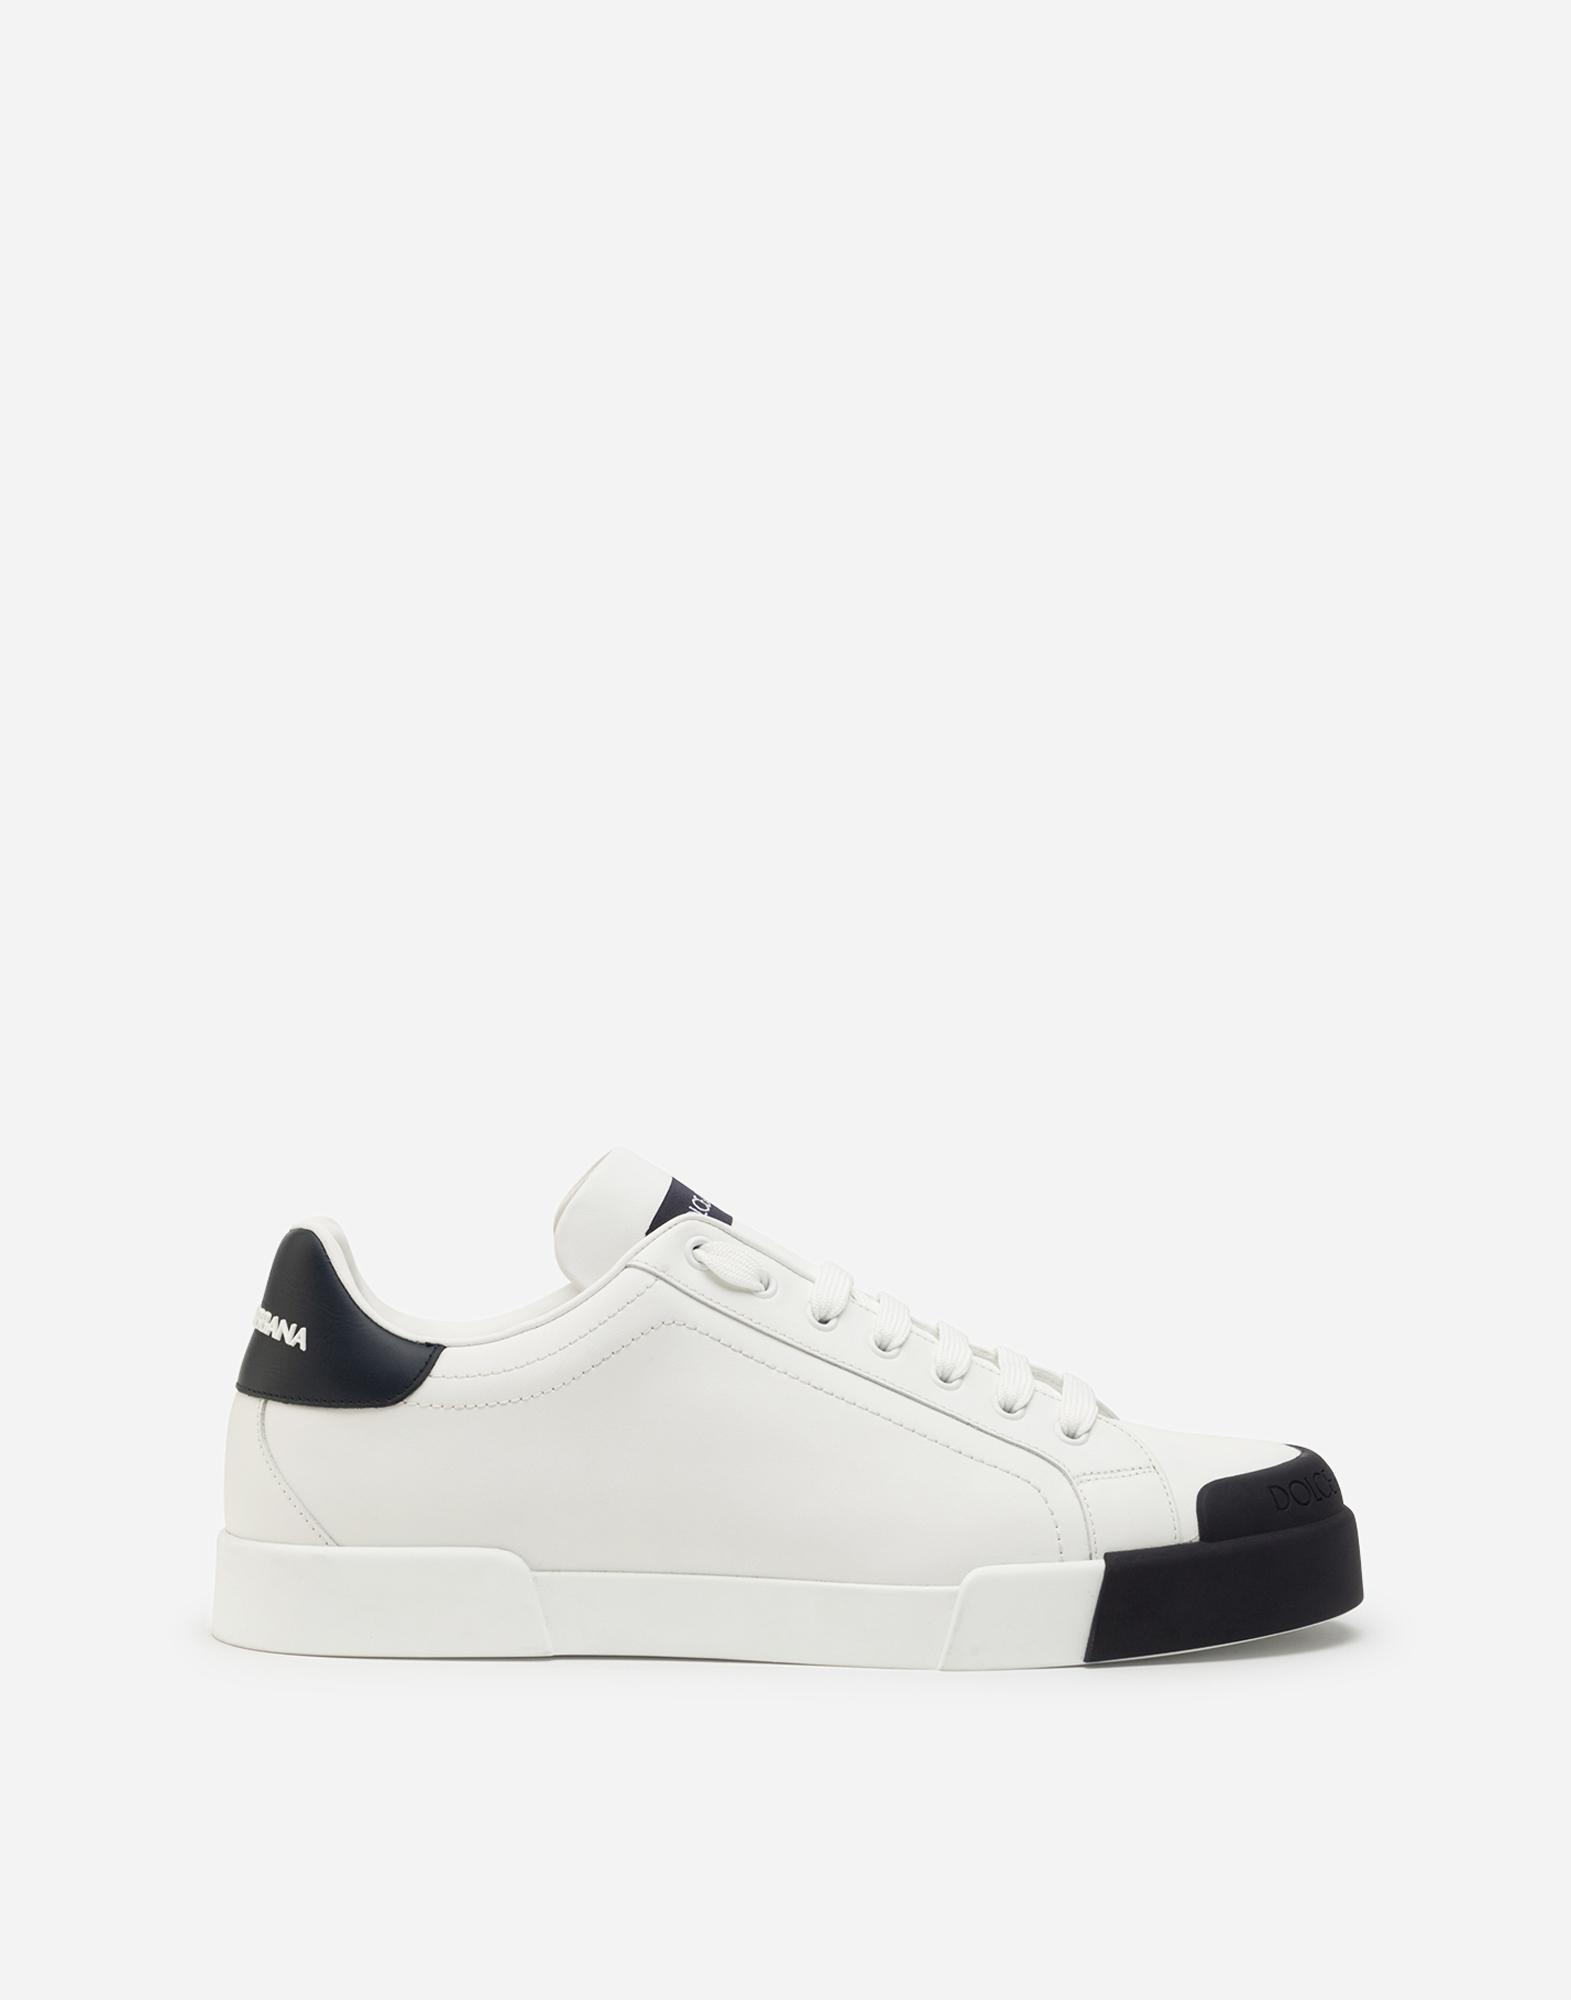 dolce & gabbana calfskin nappa portofino sneakers